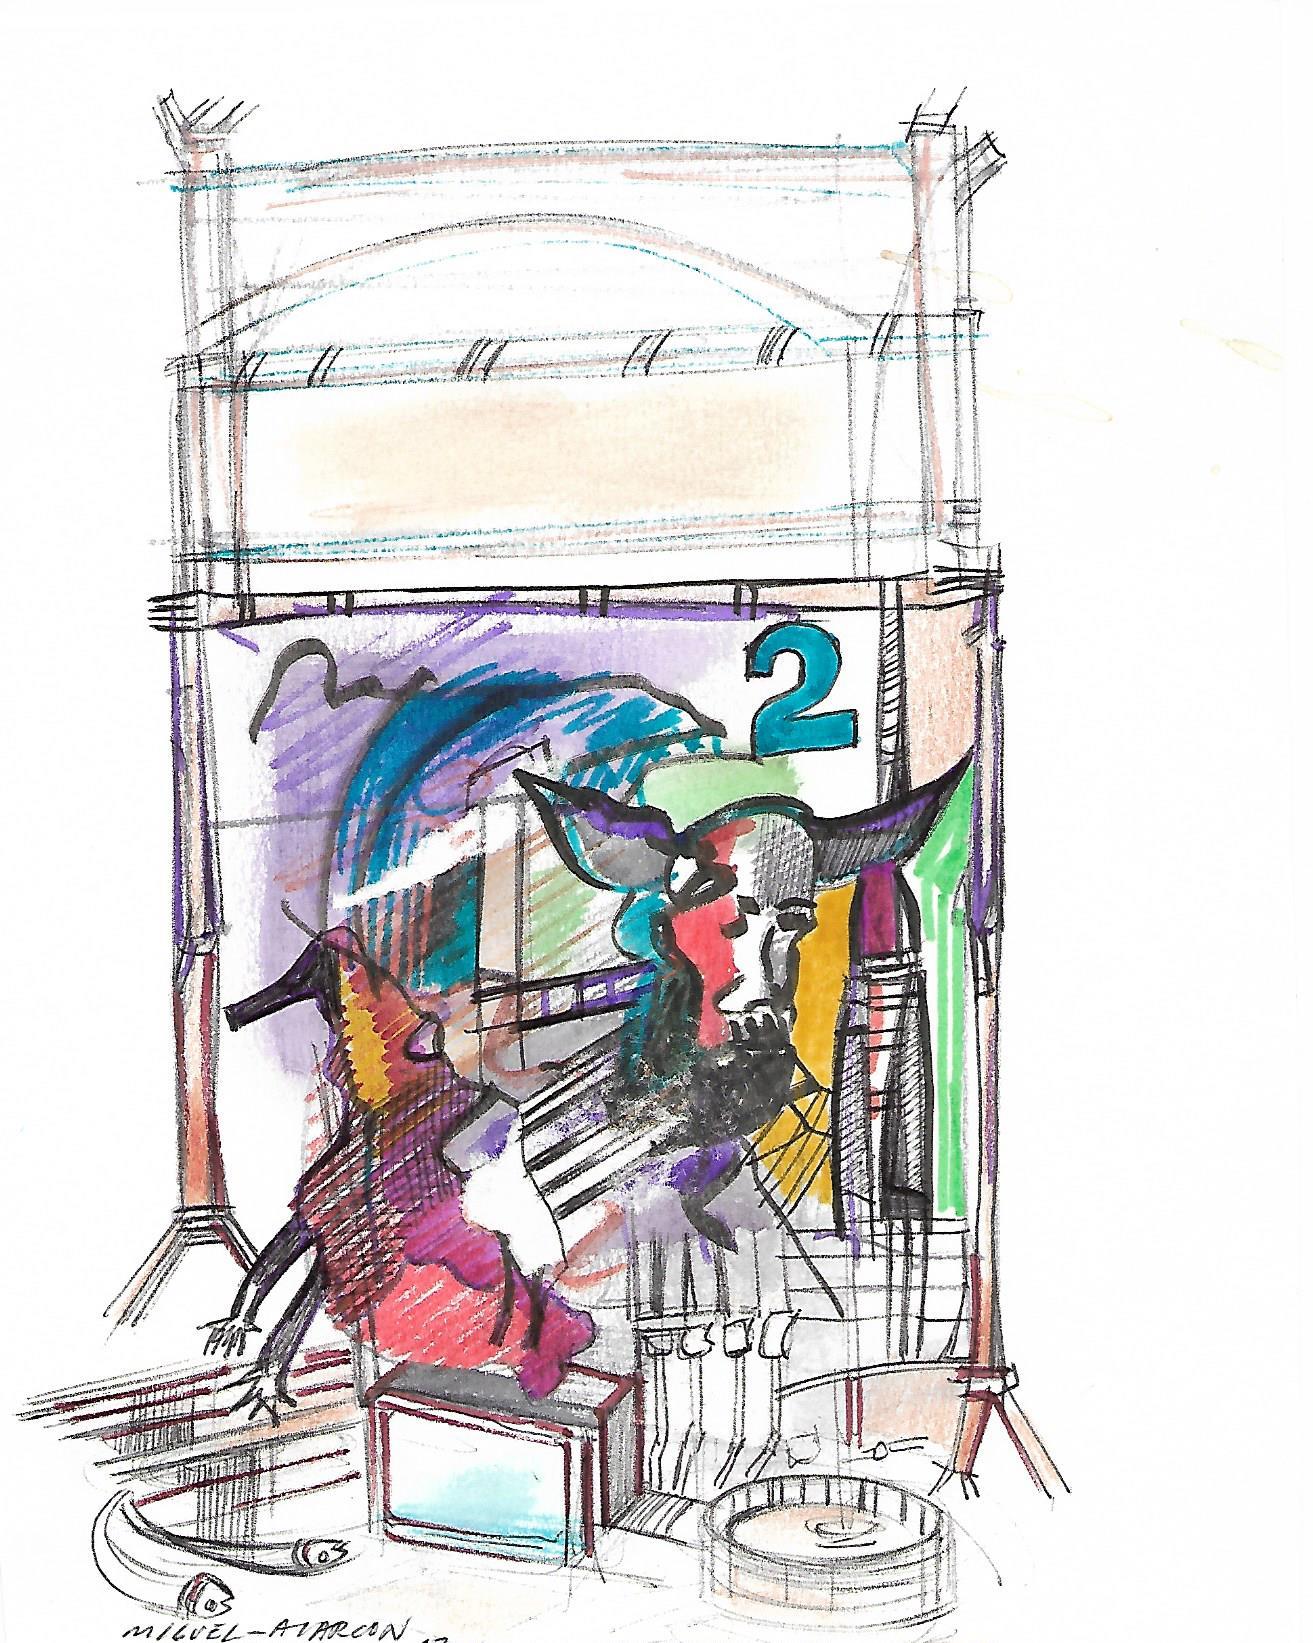 Dibujo Londres 2012 Inspiración